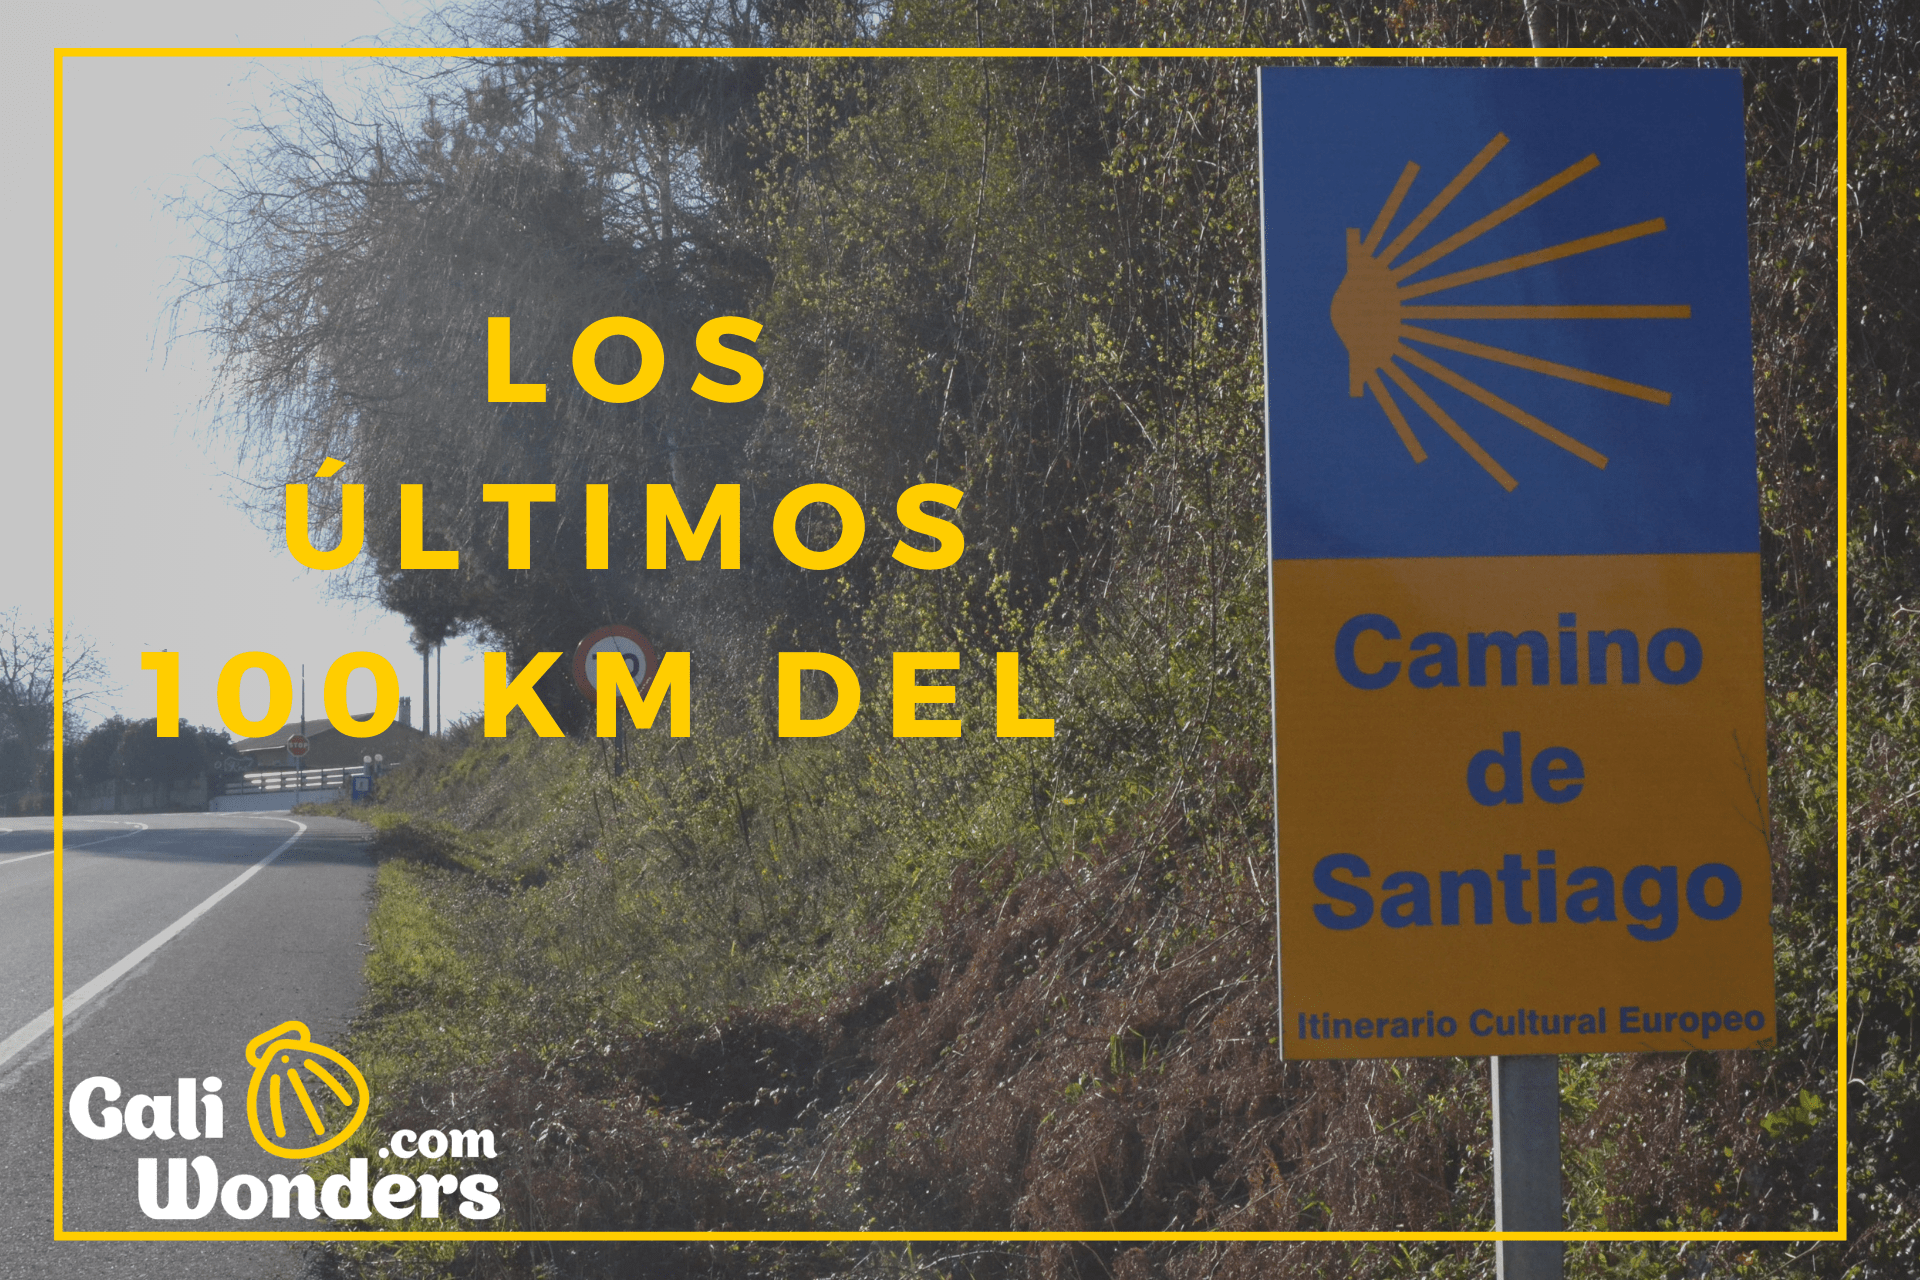 camino santiago 100 km